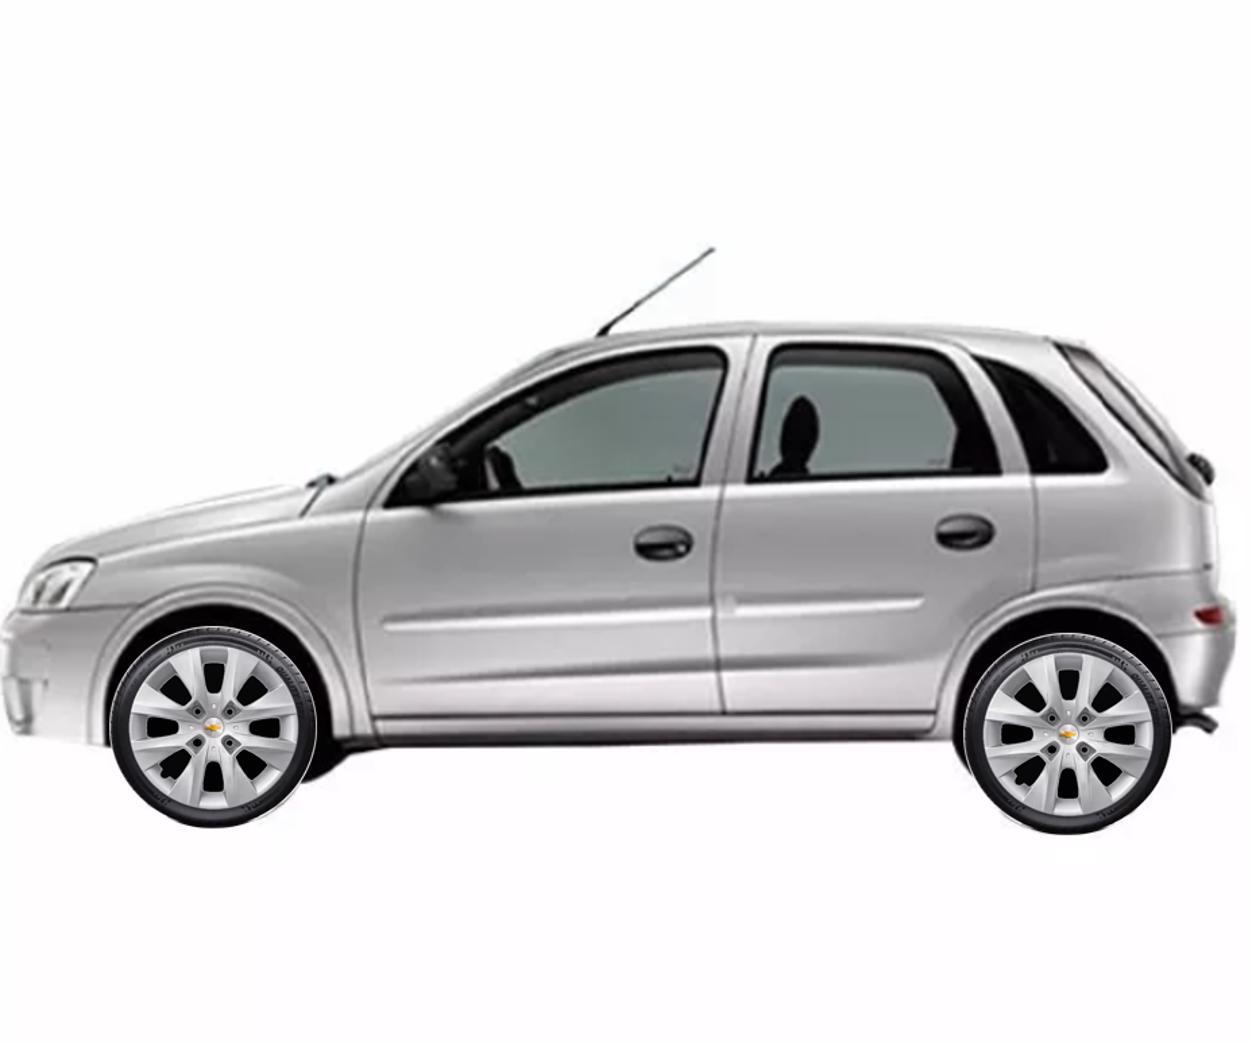 Calota Chevrolet GM Corsa Prisma Meriva Onix até 2016 Aro 14 G410